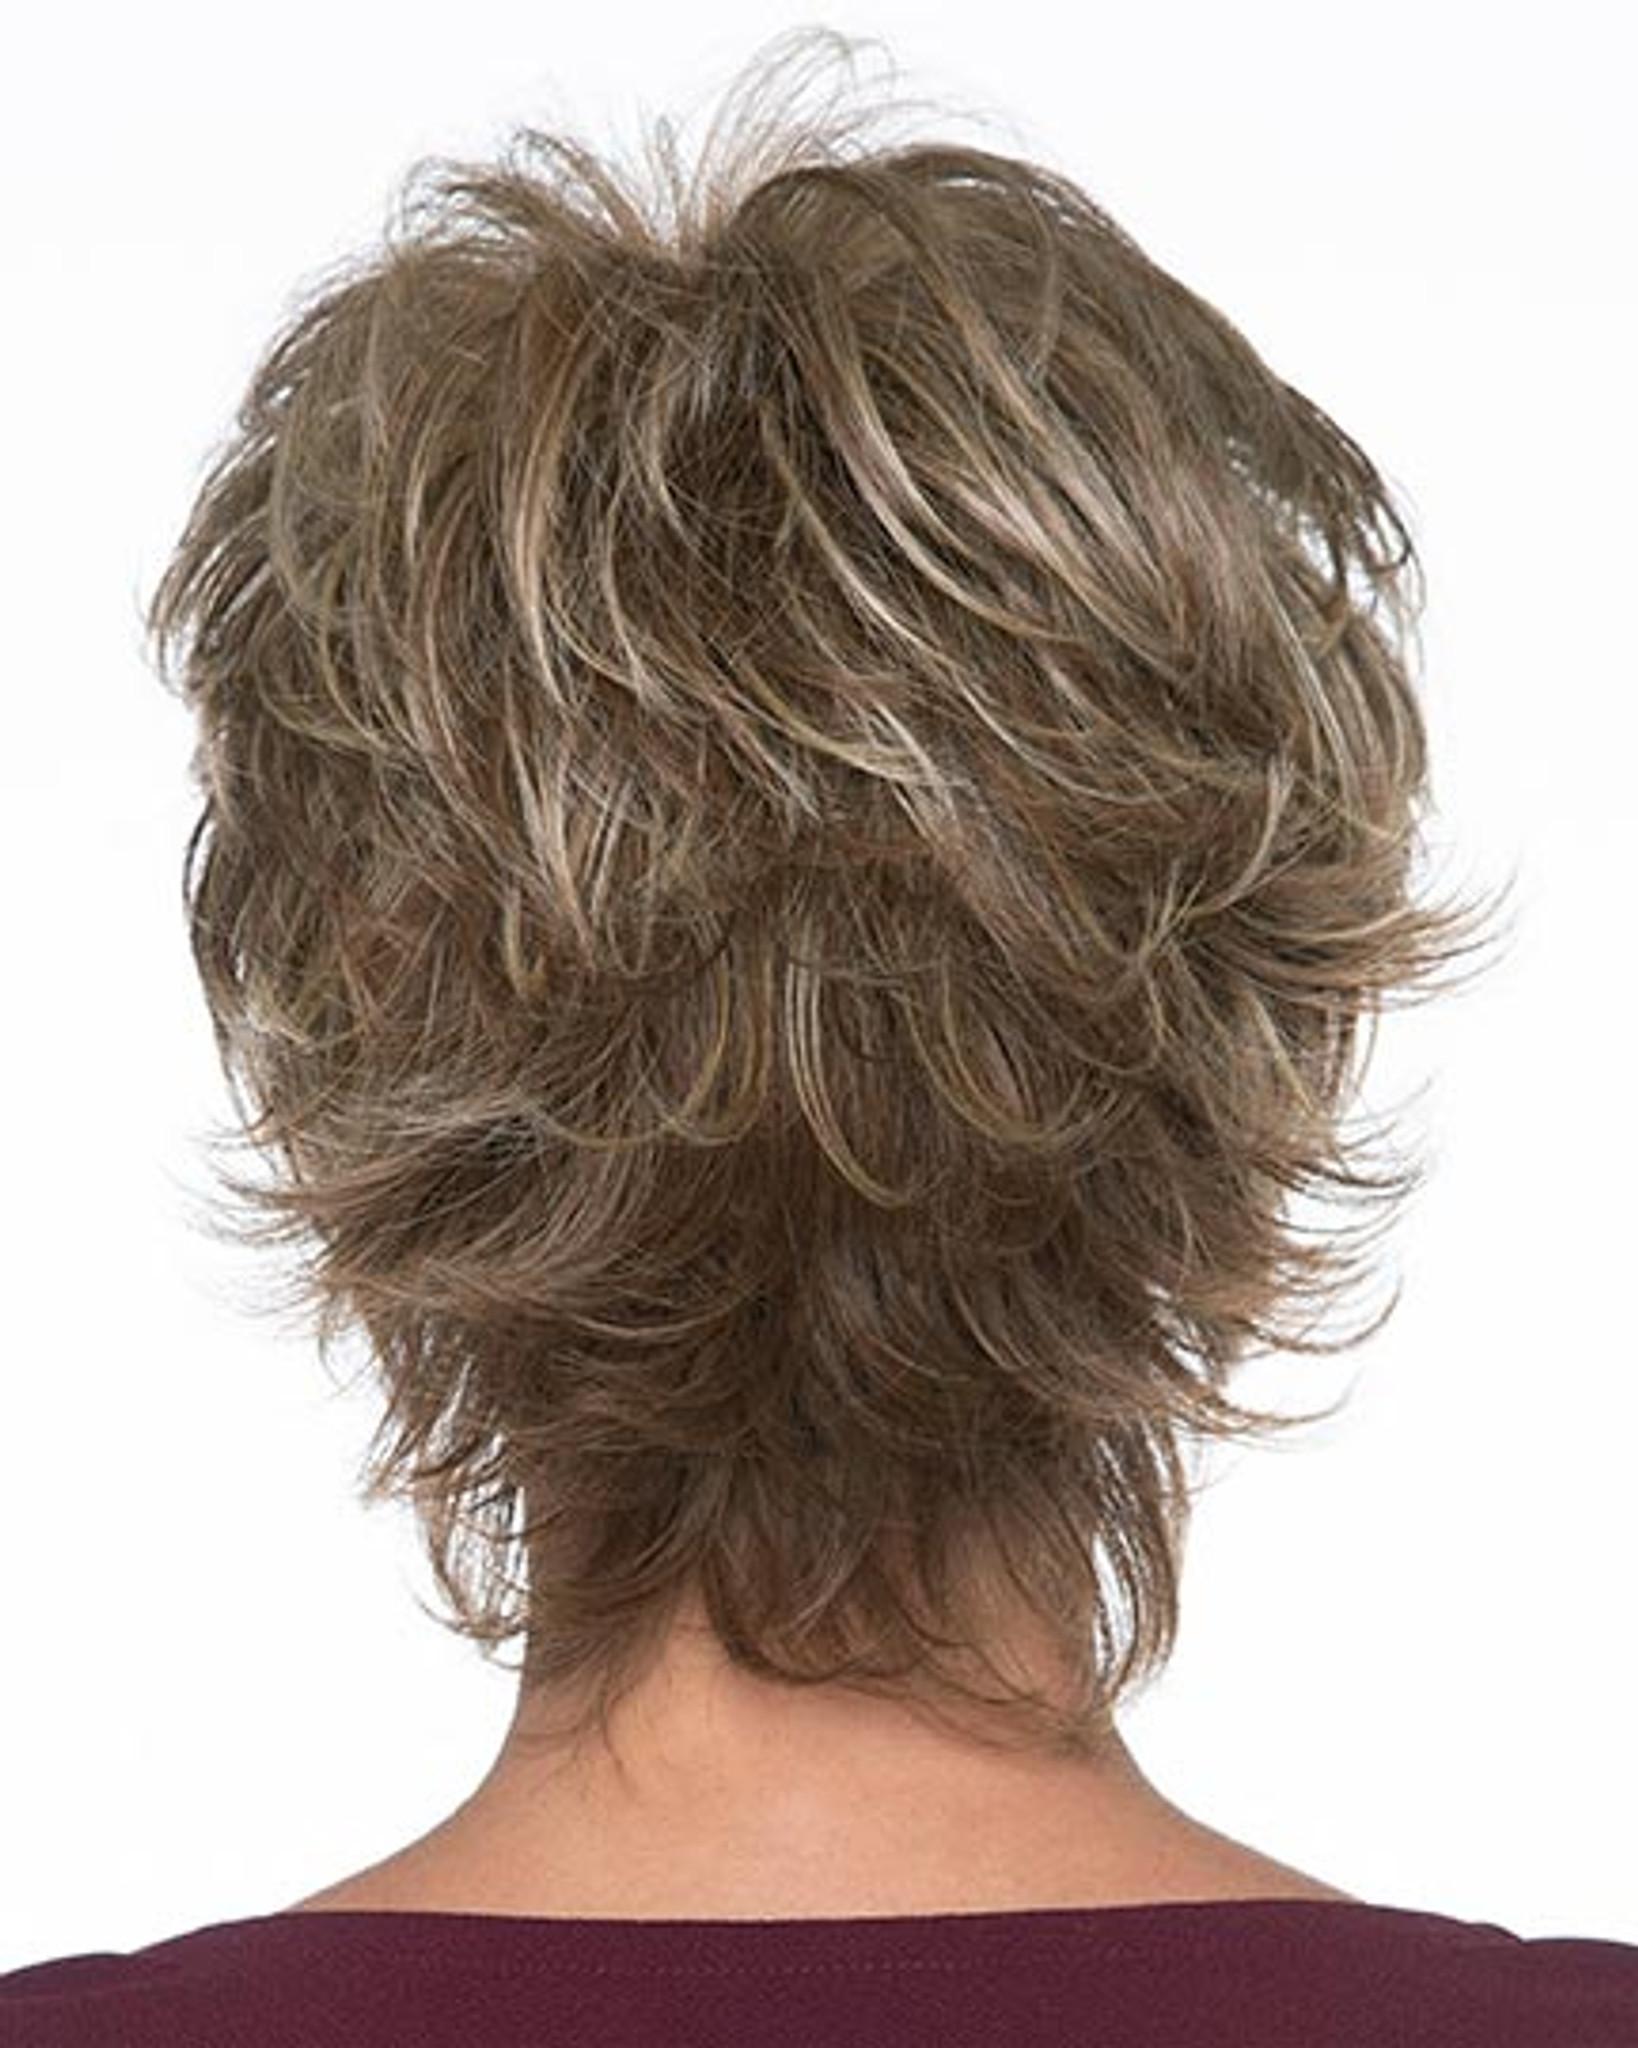 Aria - Envy Wigs - Back view